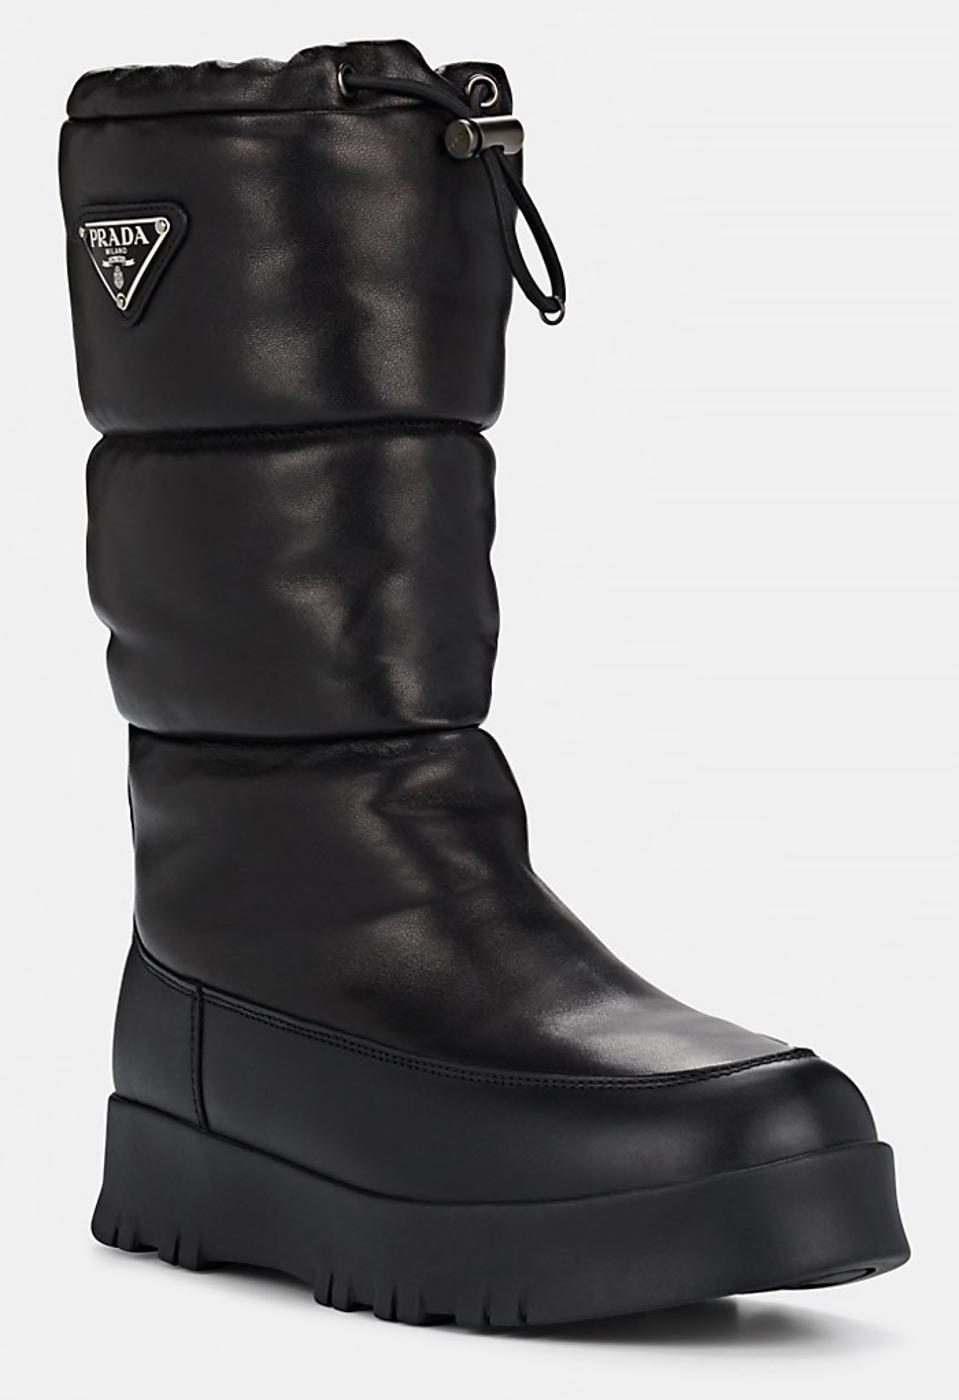 Prada_Best Designer Winter Boots